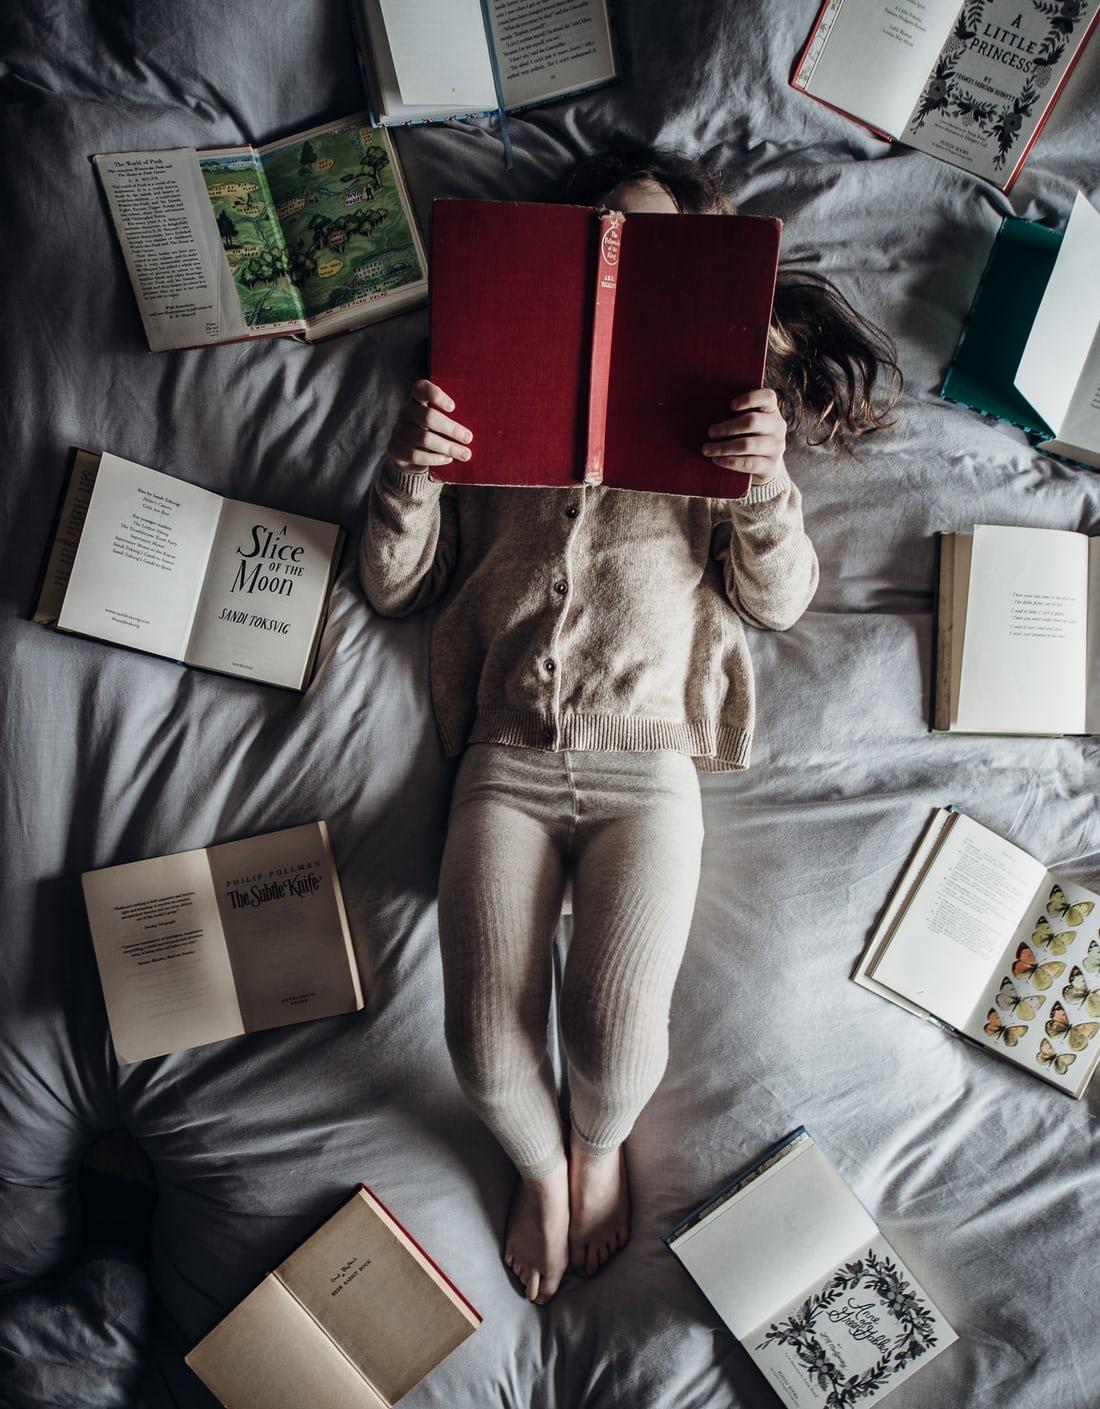 прочитать 10 книг за месяц